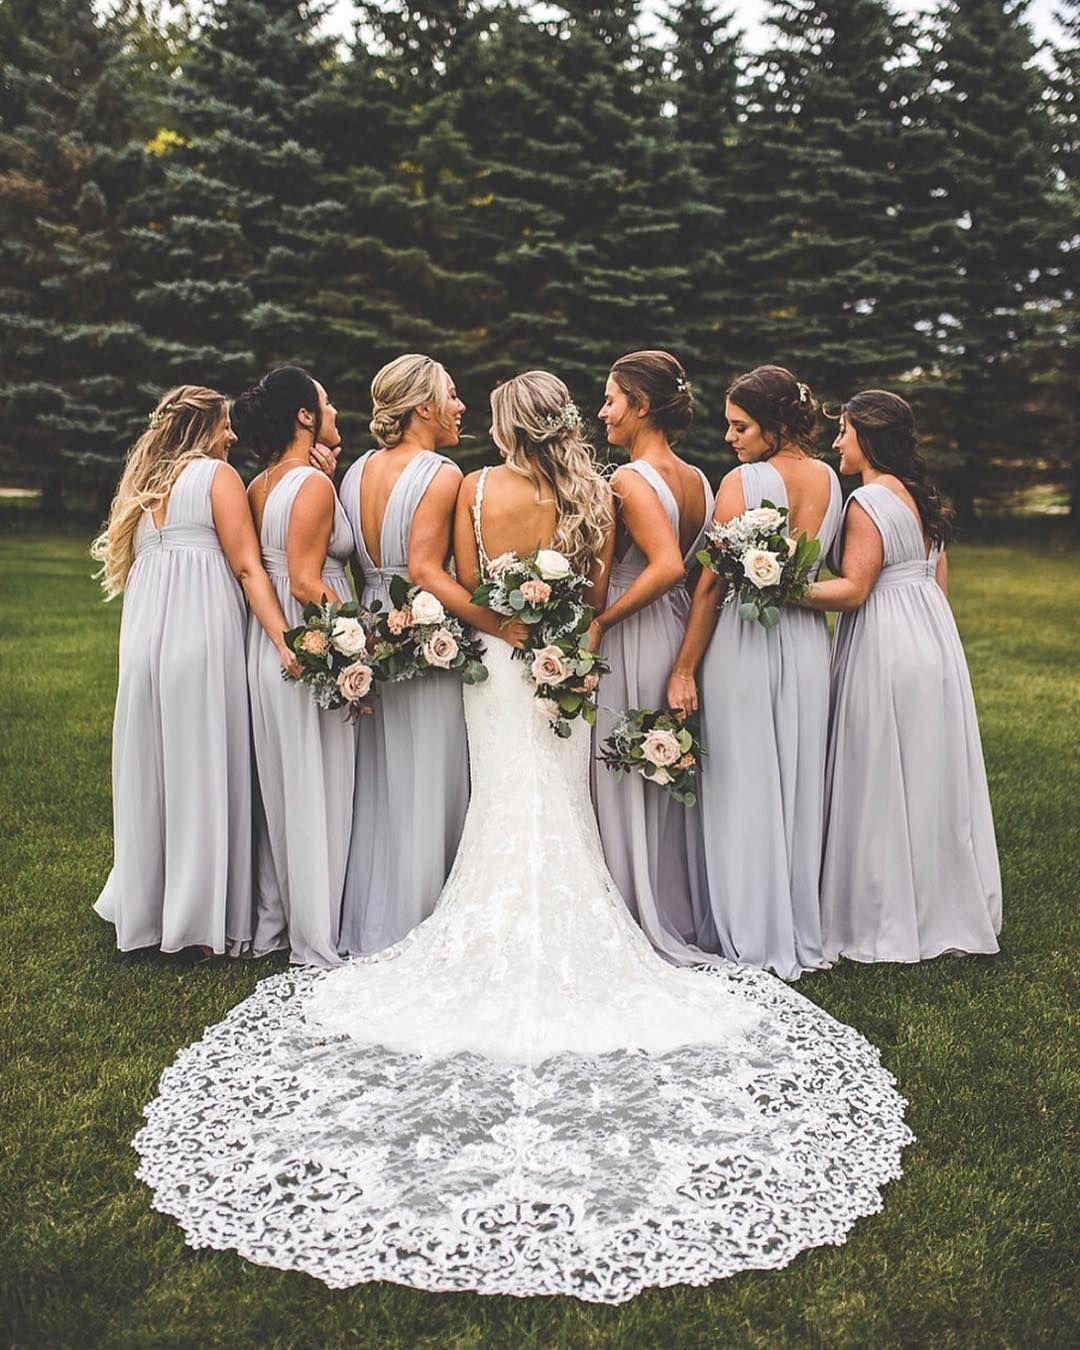 Bridesmaids wedding photo ideas fall bridesmaid dresses